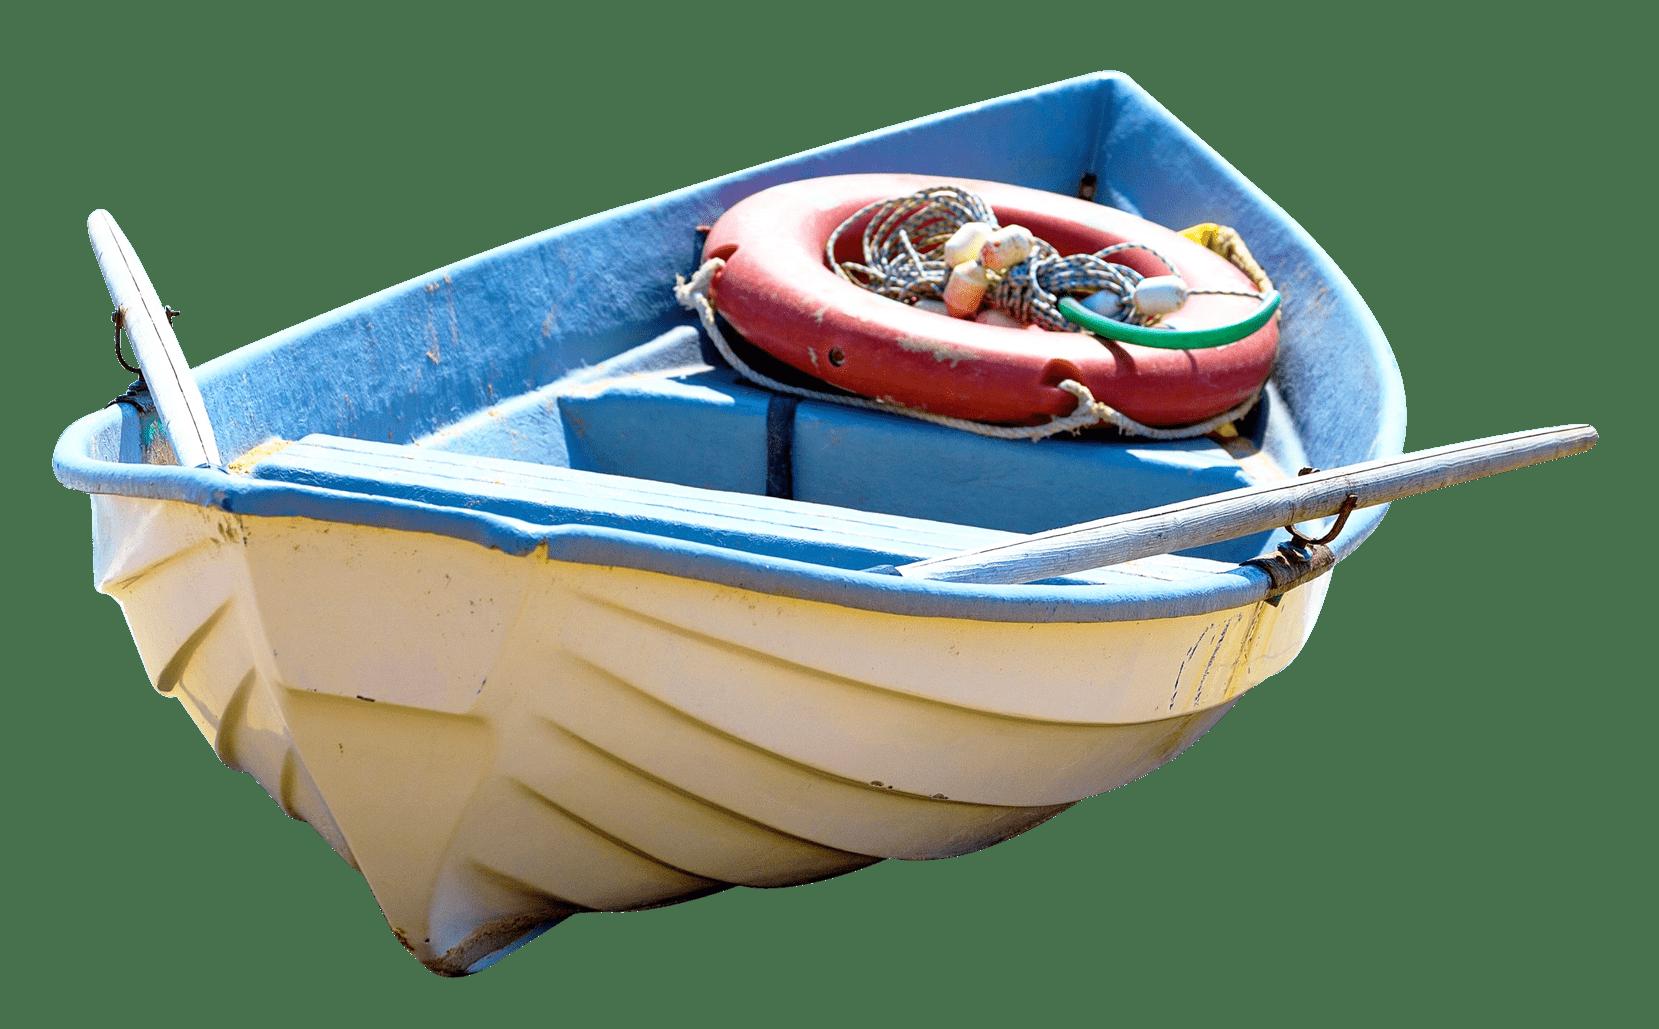 Fishing Net clipart trawler Net Fishing Boat Clipart transparent